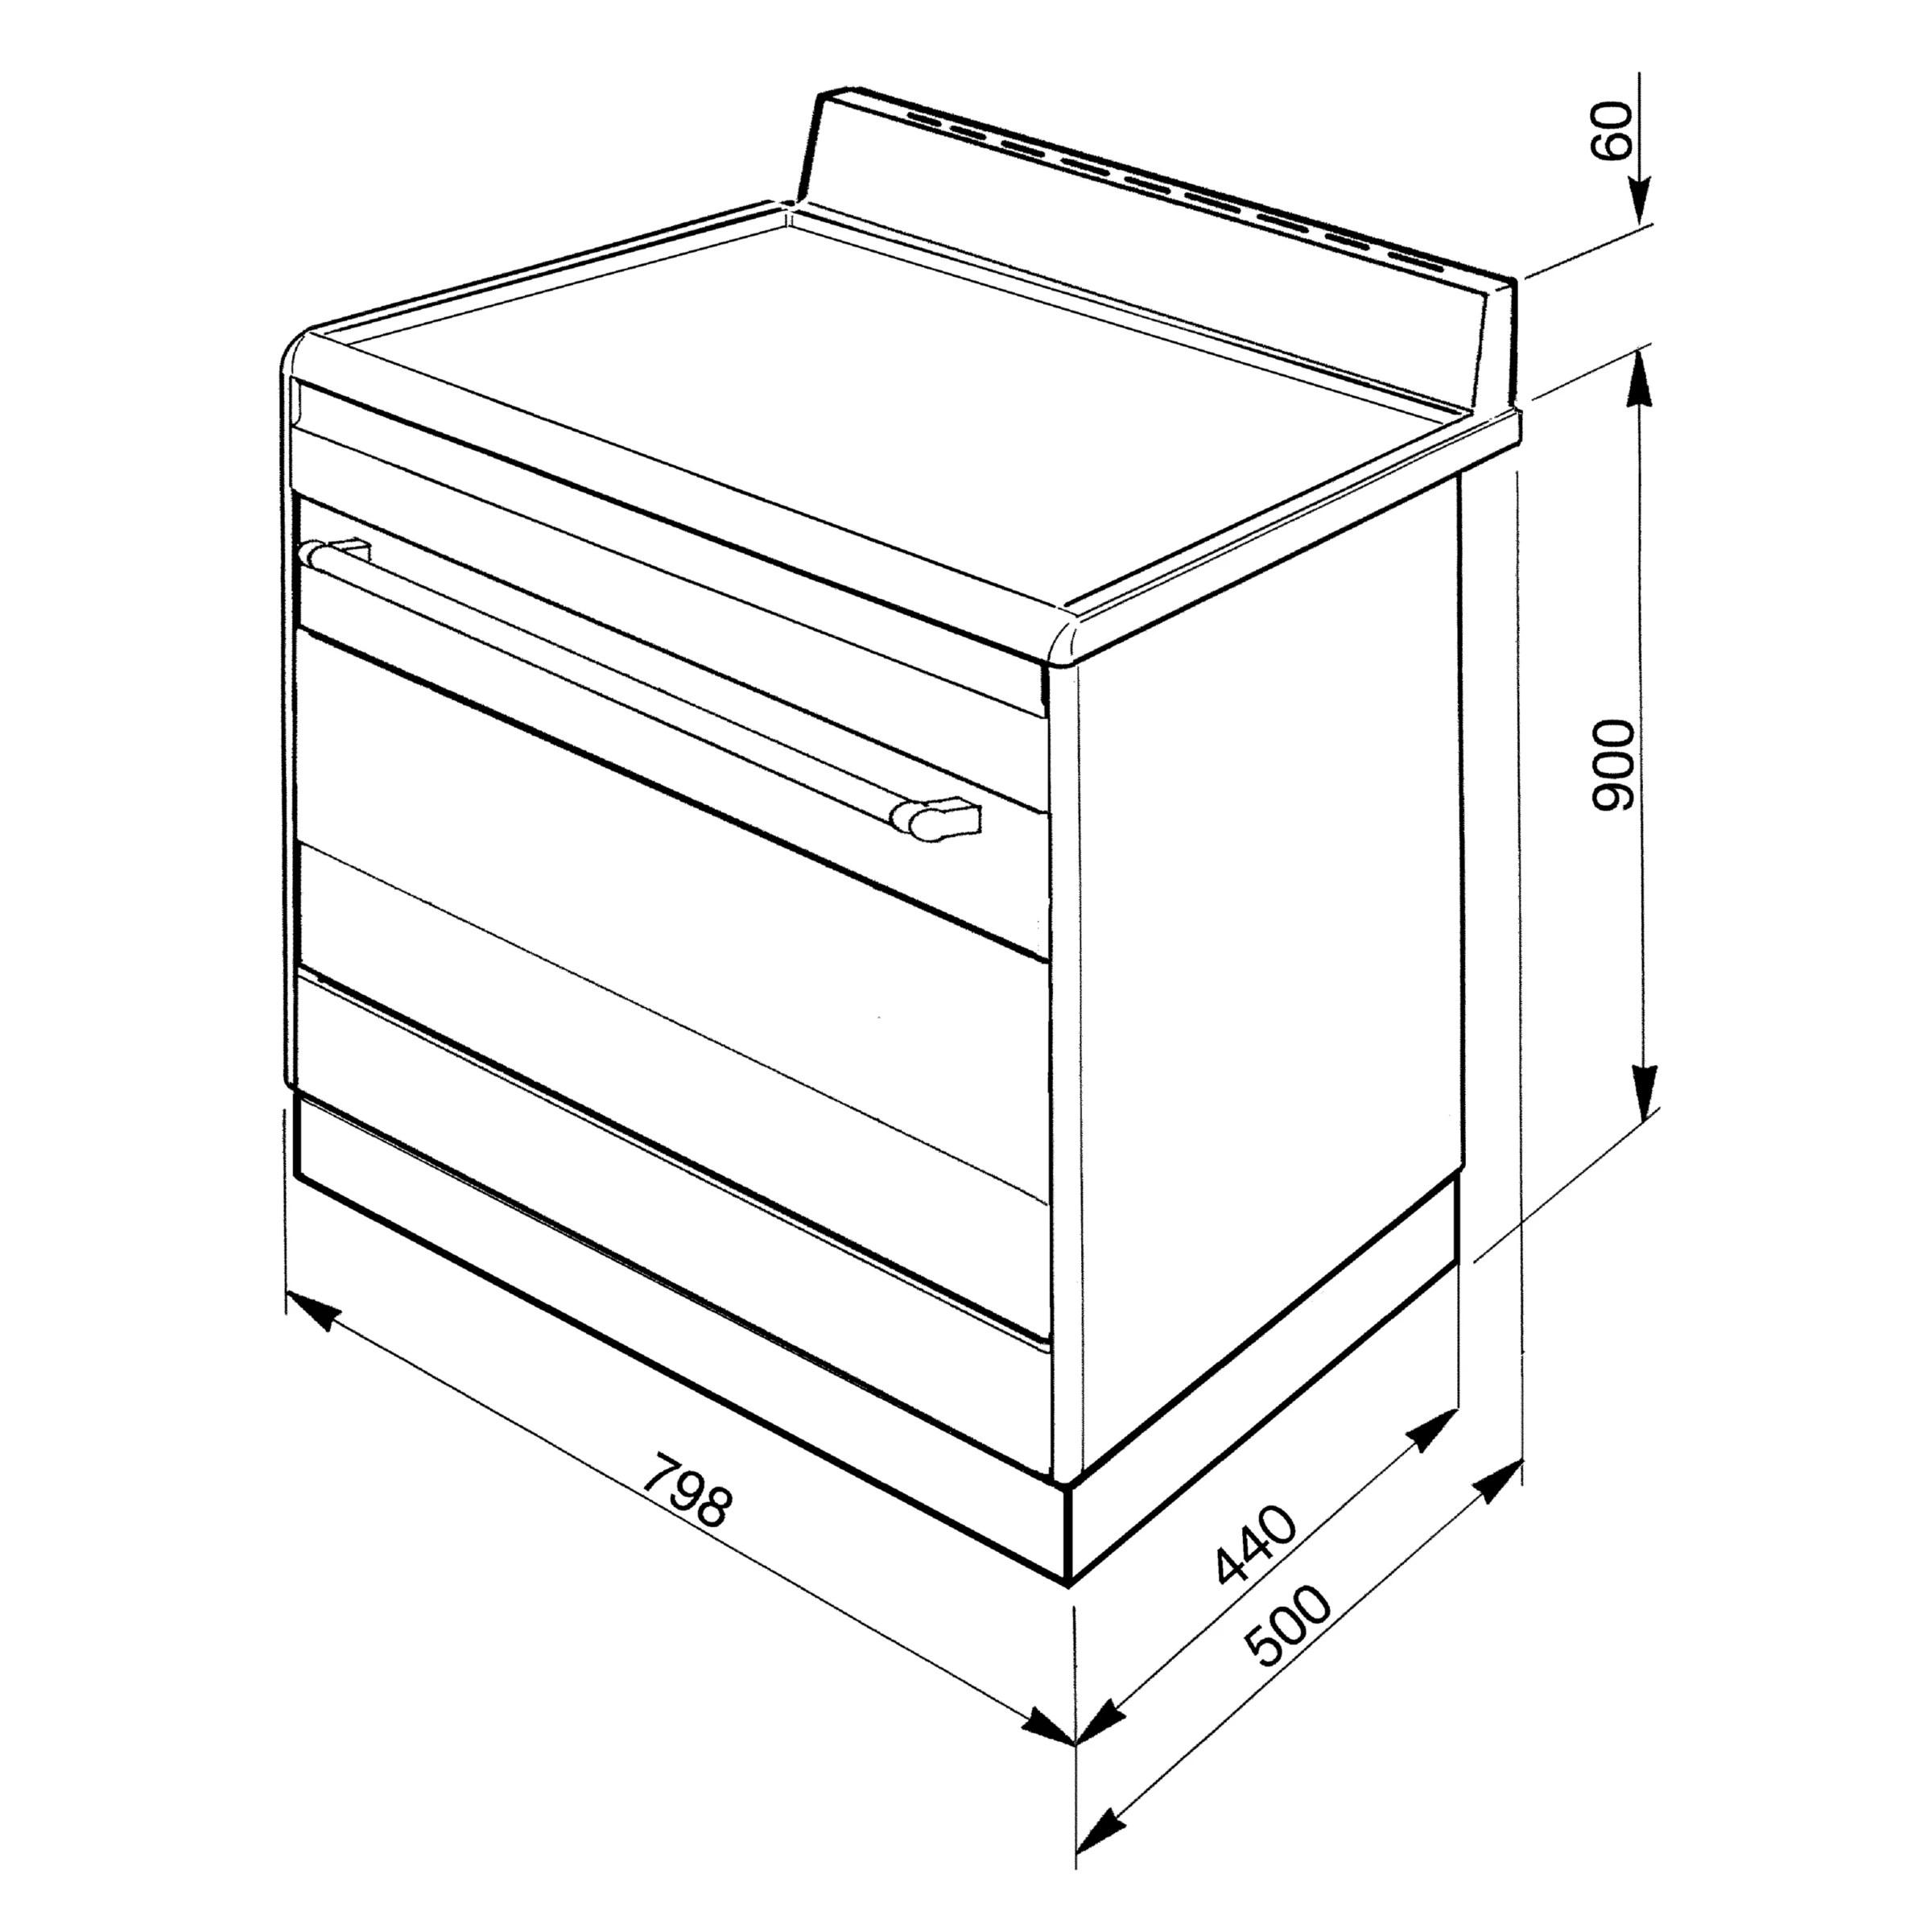 buysmeg suk81mfx8 dual fuel range cooker stainless steel online at johnlewis com [ 1440 x 1920 Pixel ]